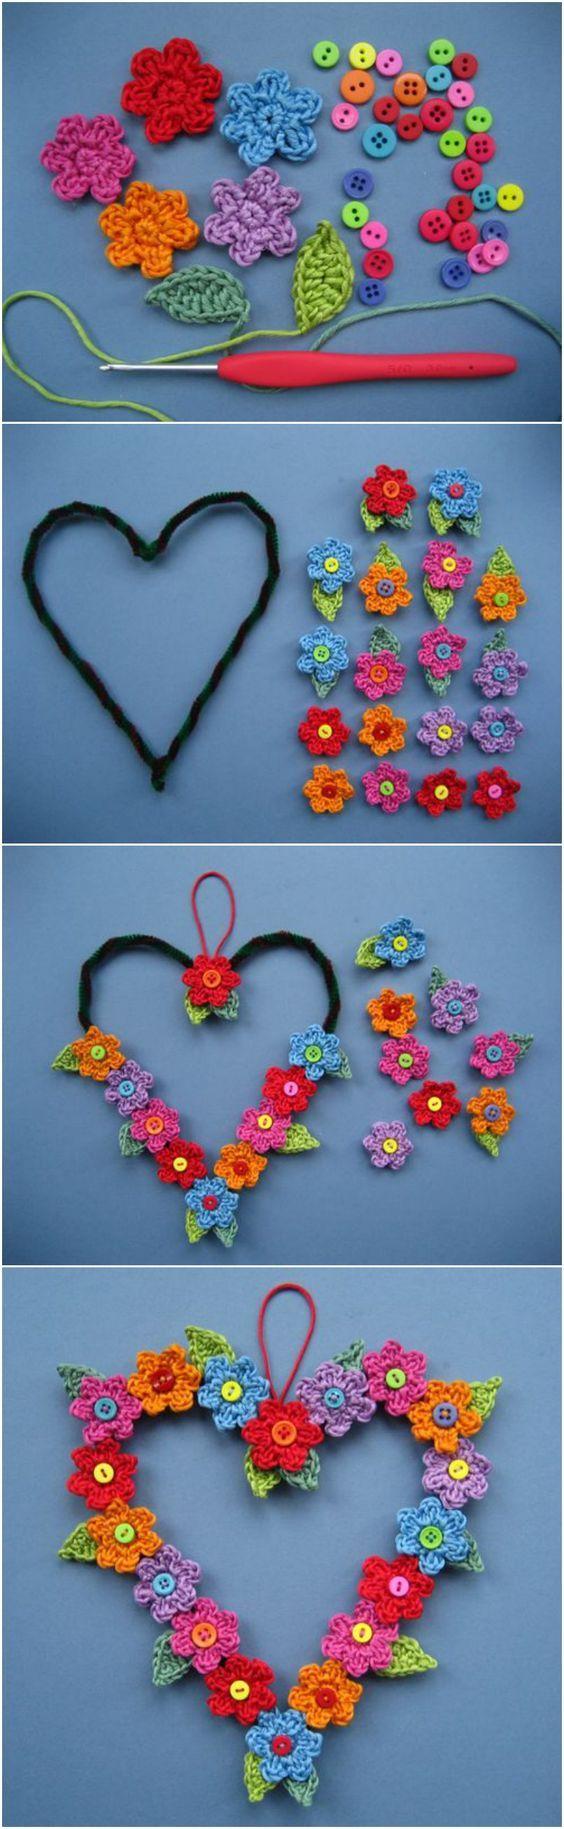 Crochet Button Flowers Lots Of Free Patterns